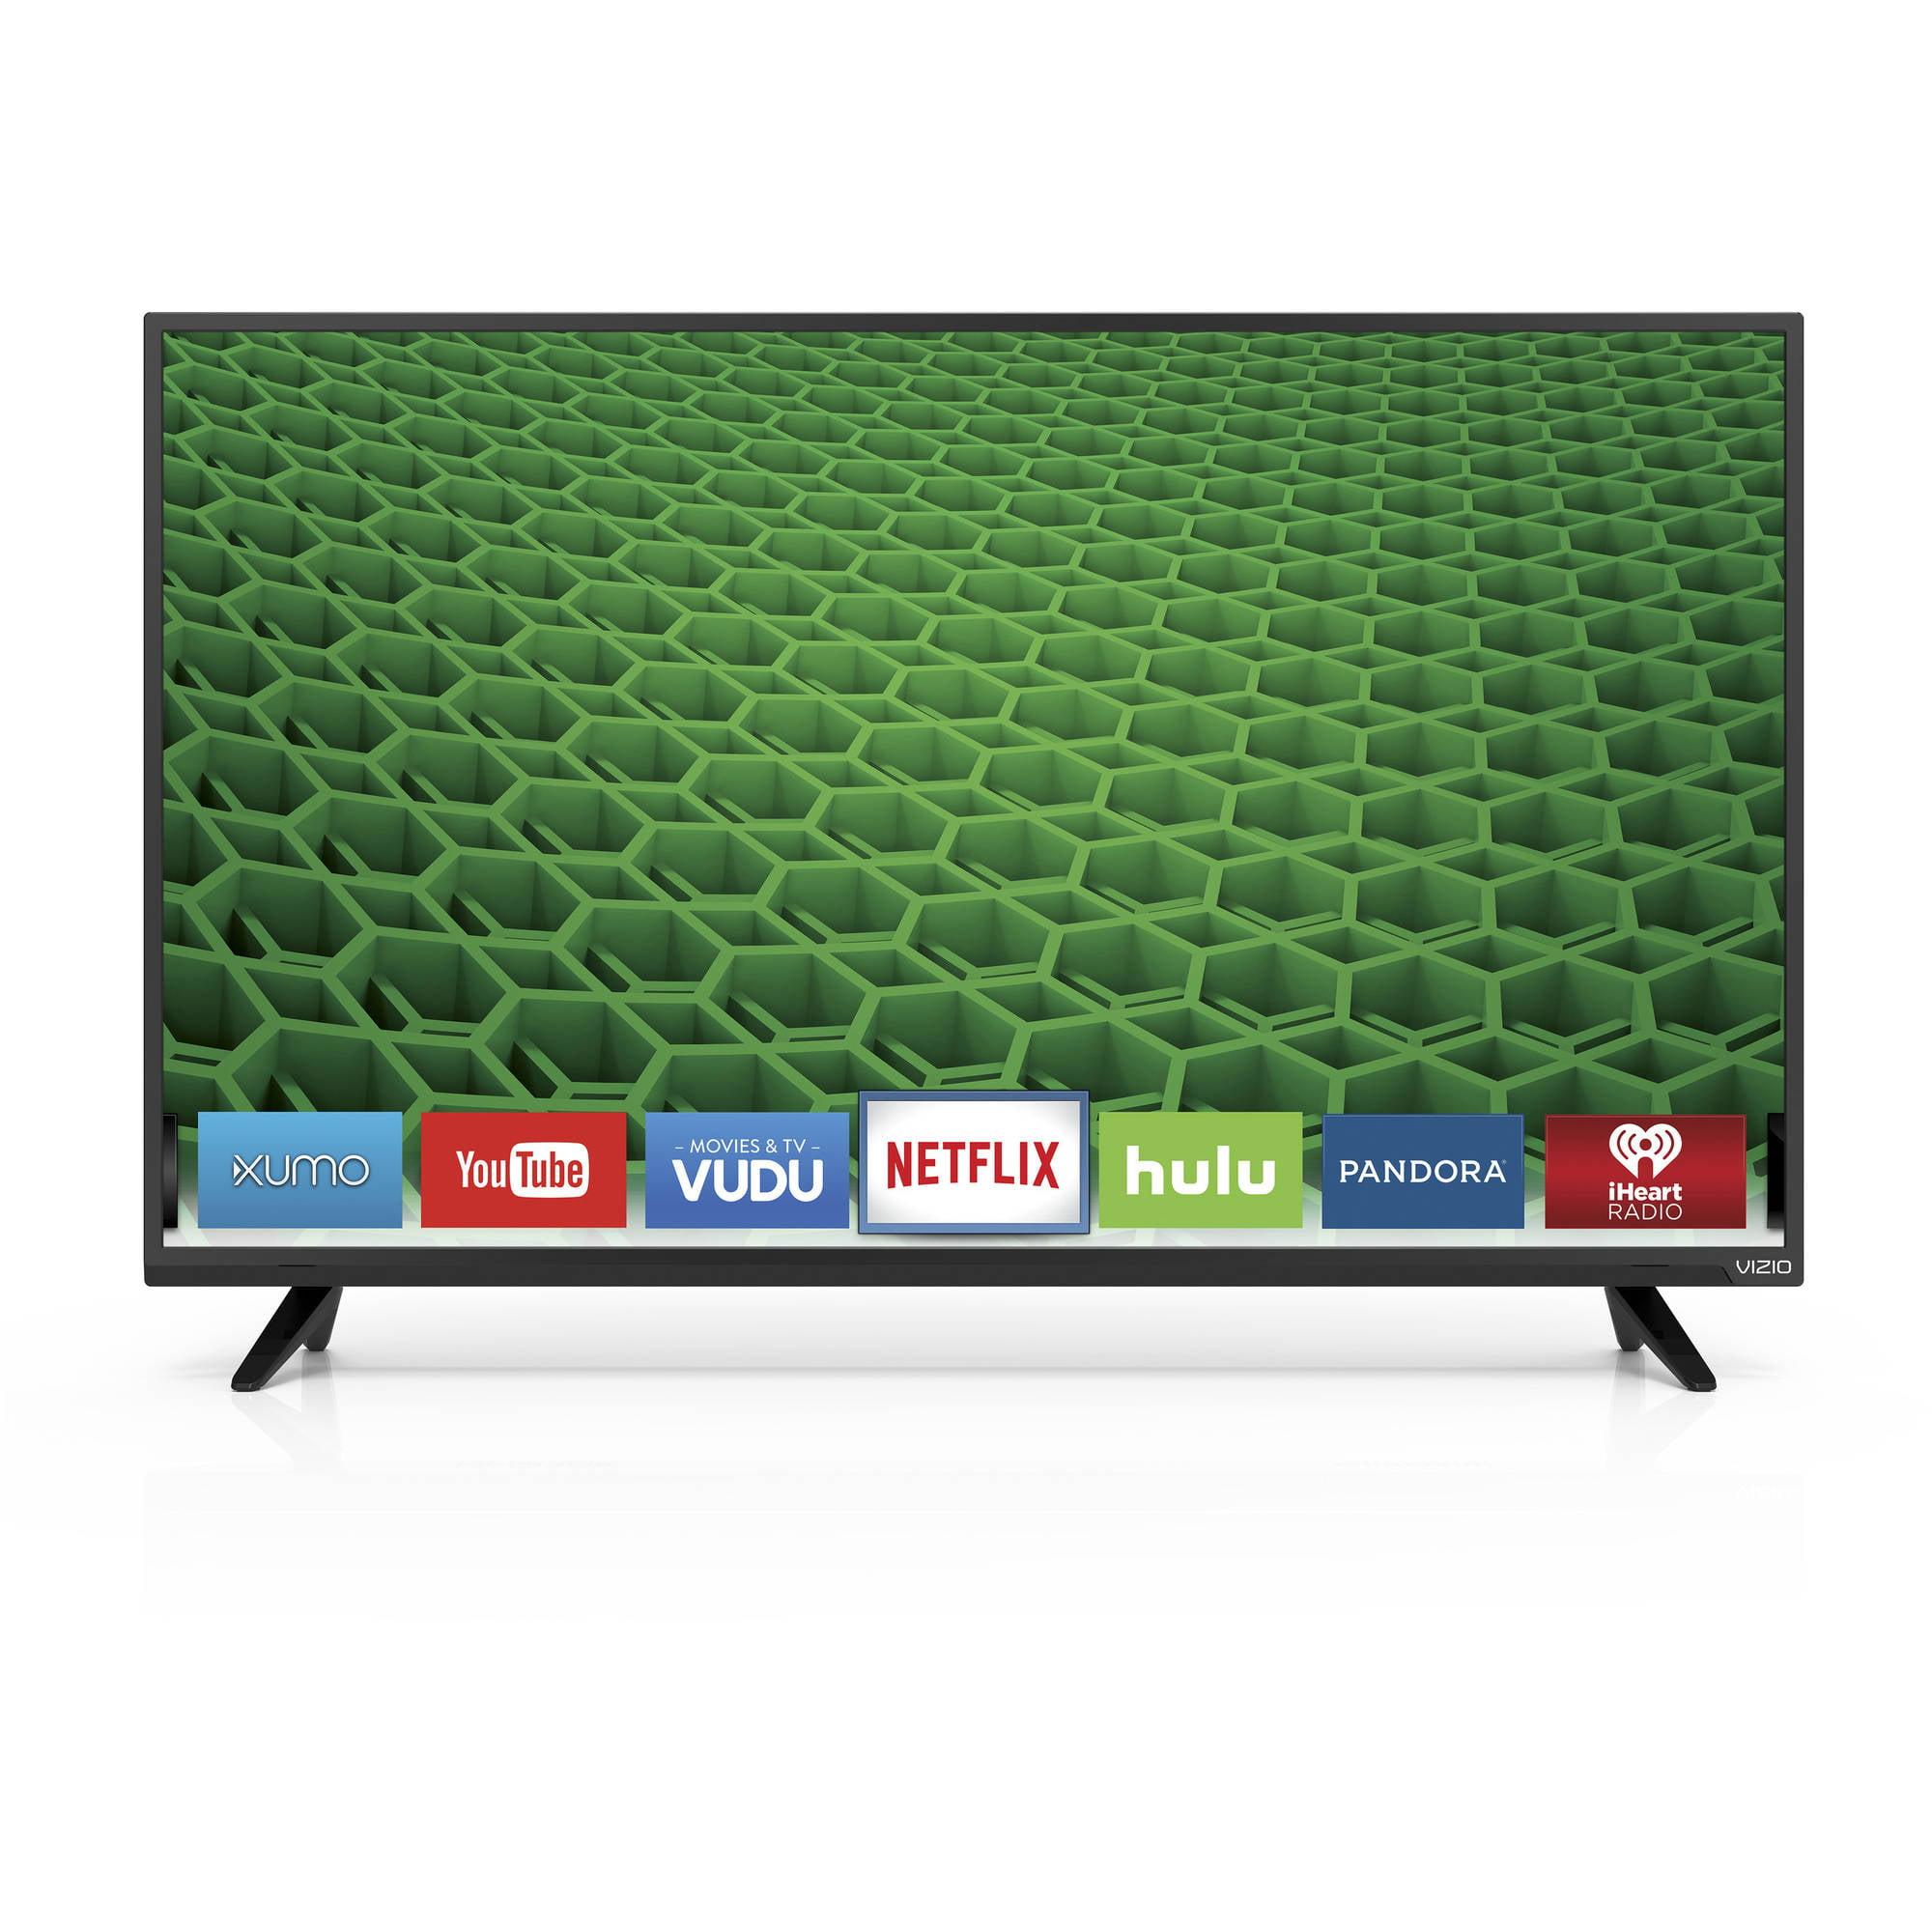 "VIZIO 48"" Class FHD (1080P) Smart LED TV (D48f-E0)"